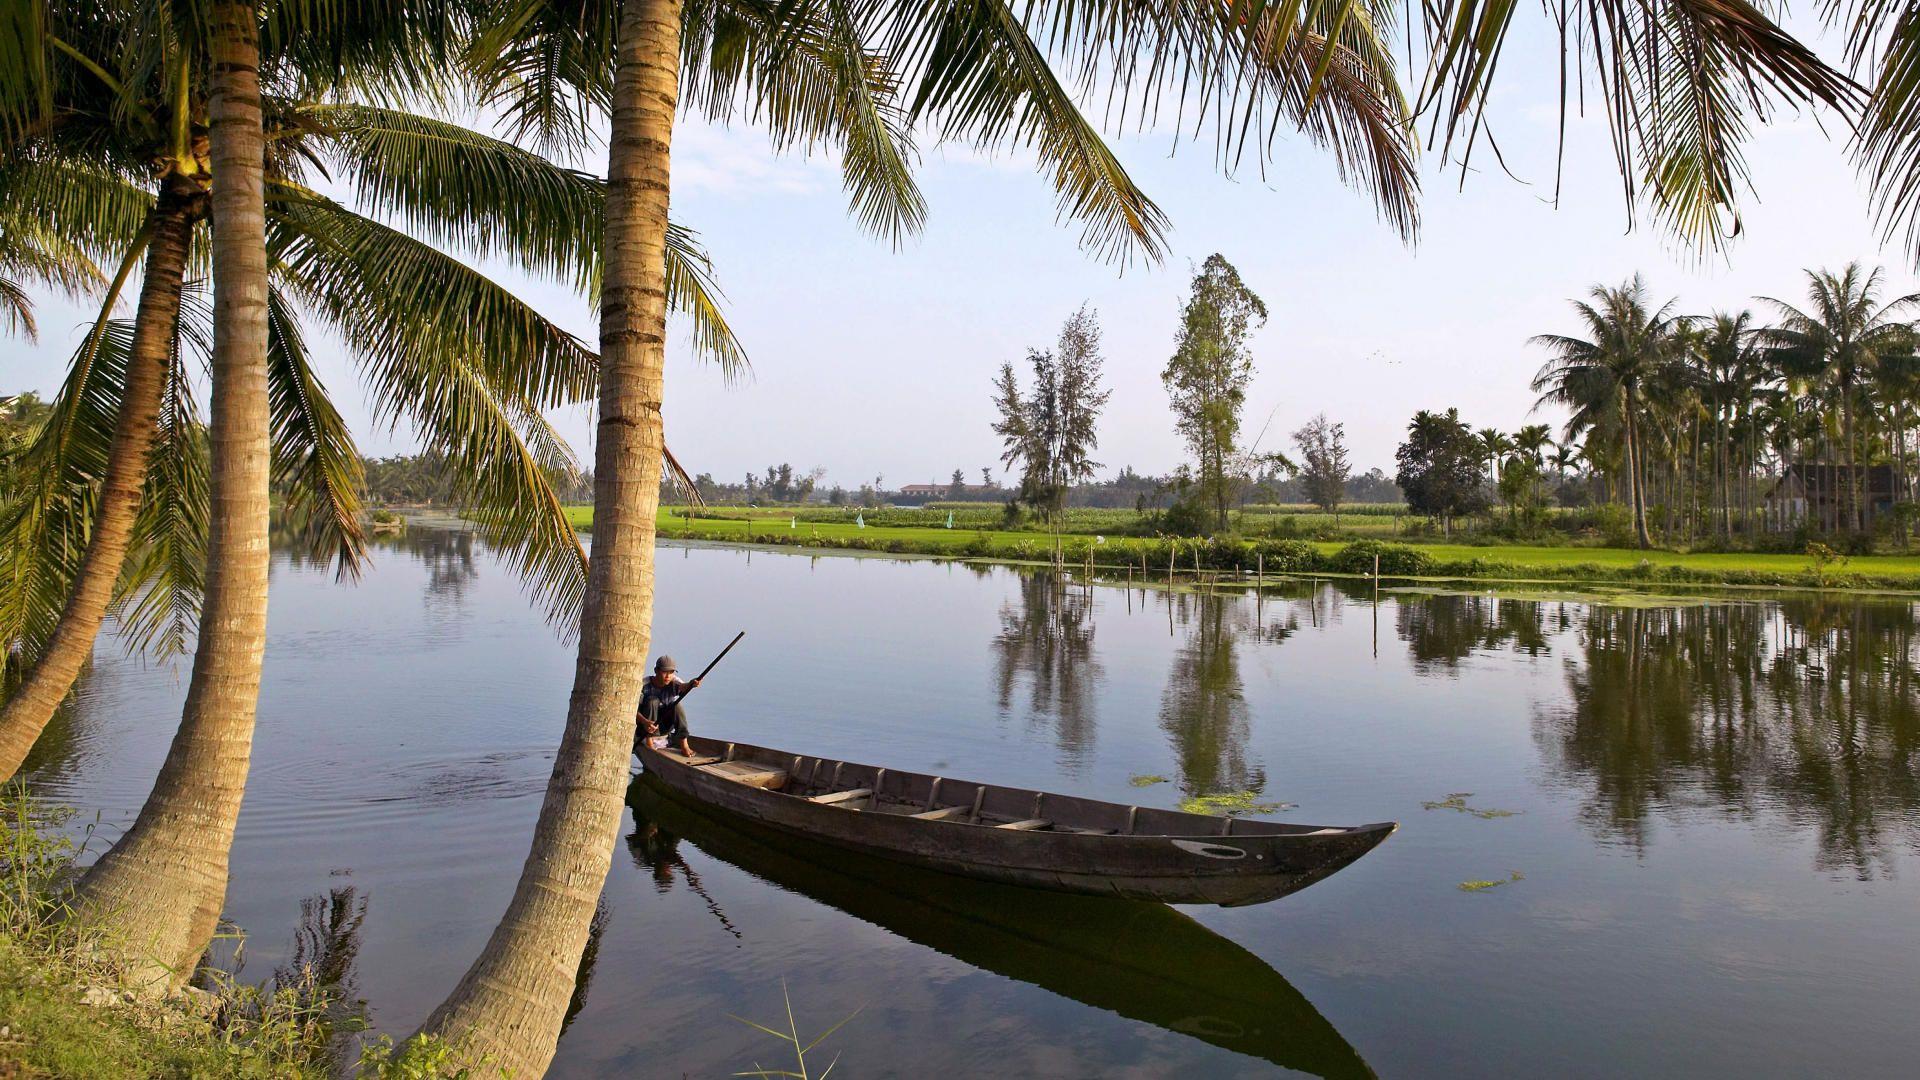 Countries 123 Hd Wallpaper Sudvietnam Vietnam Reise Reisebericht